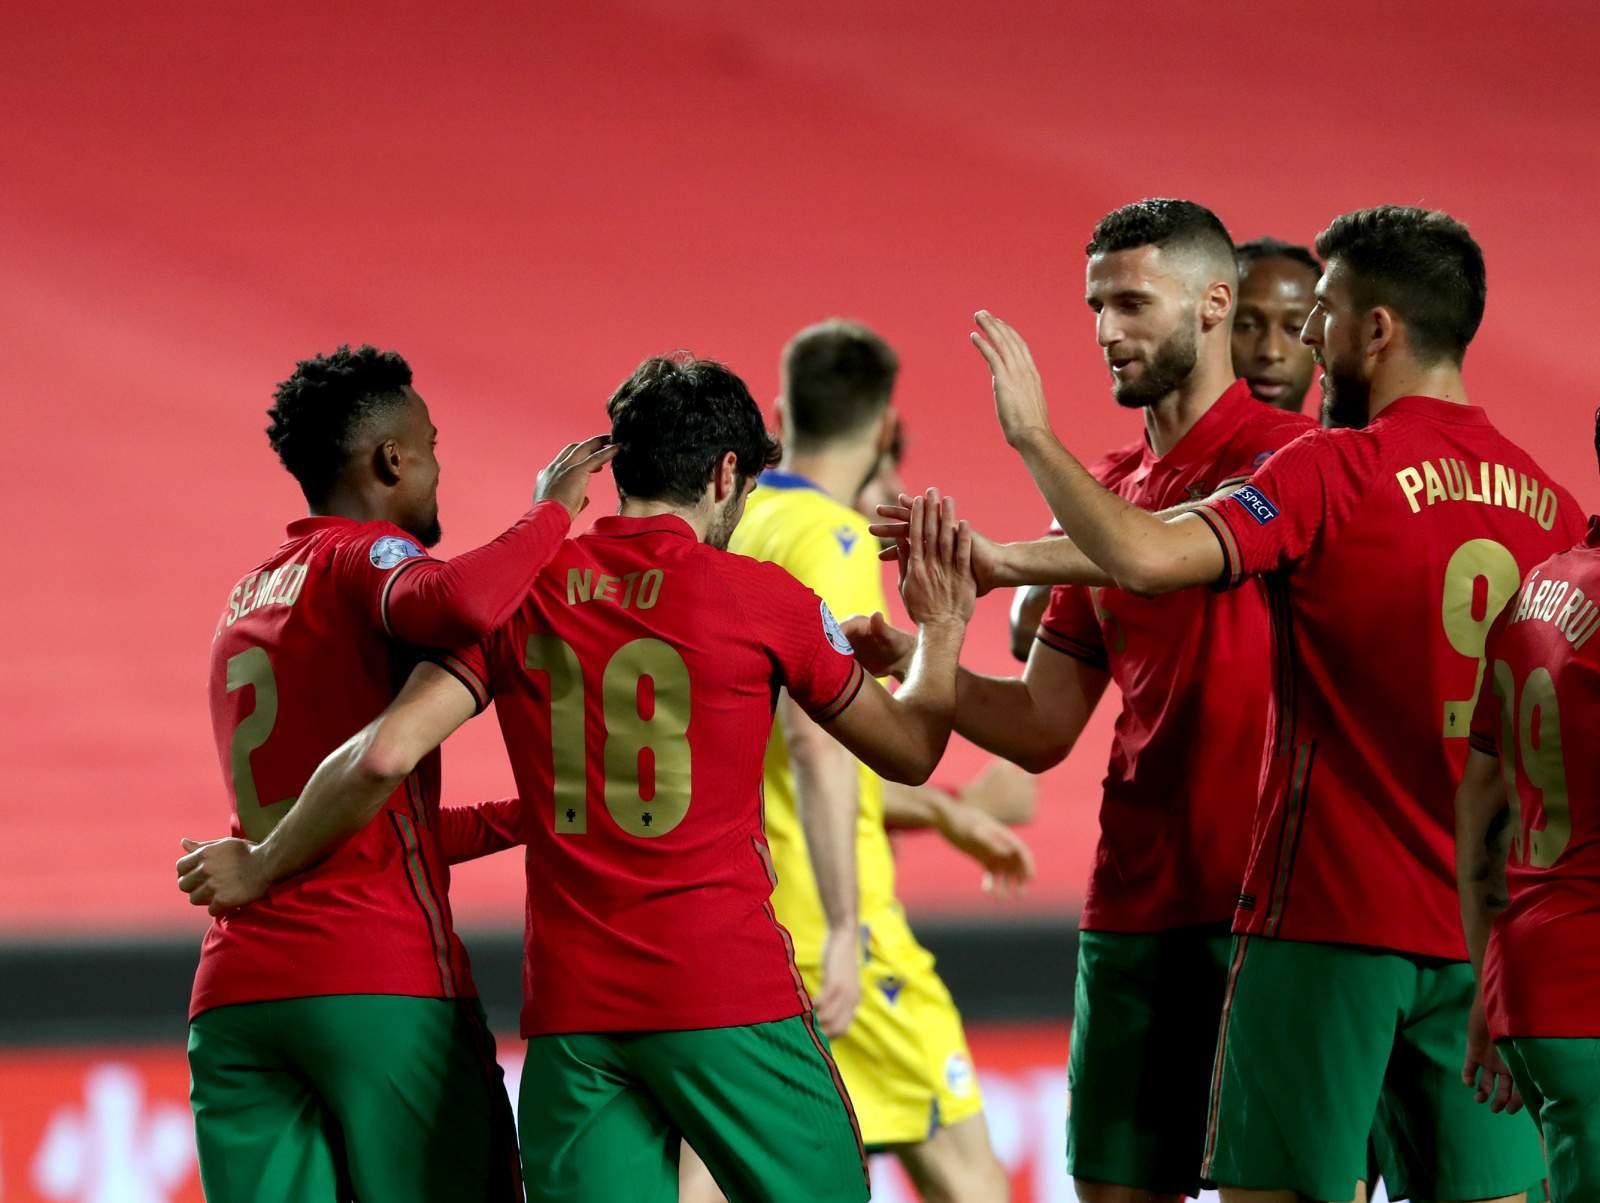 Португалия - Израиль - 4:0 (закончен)